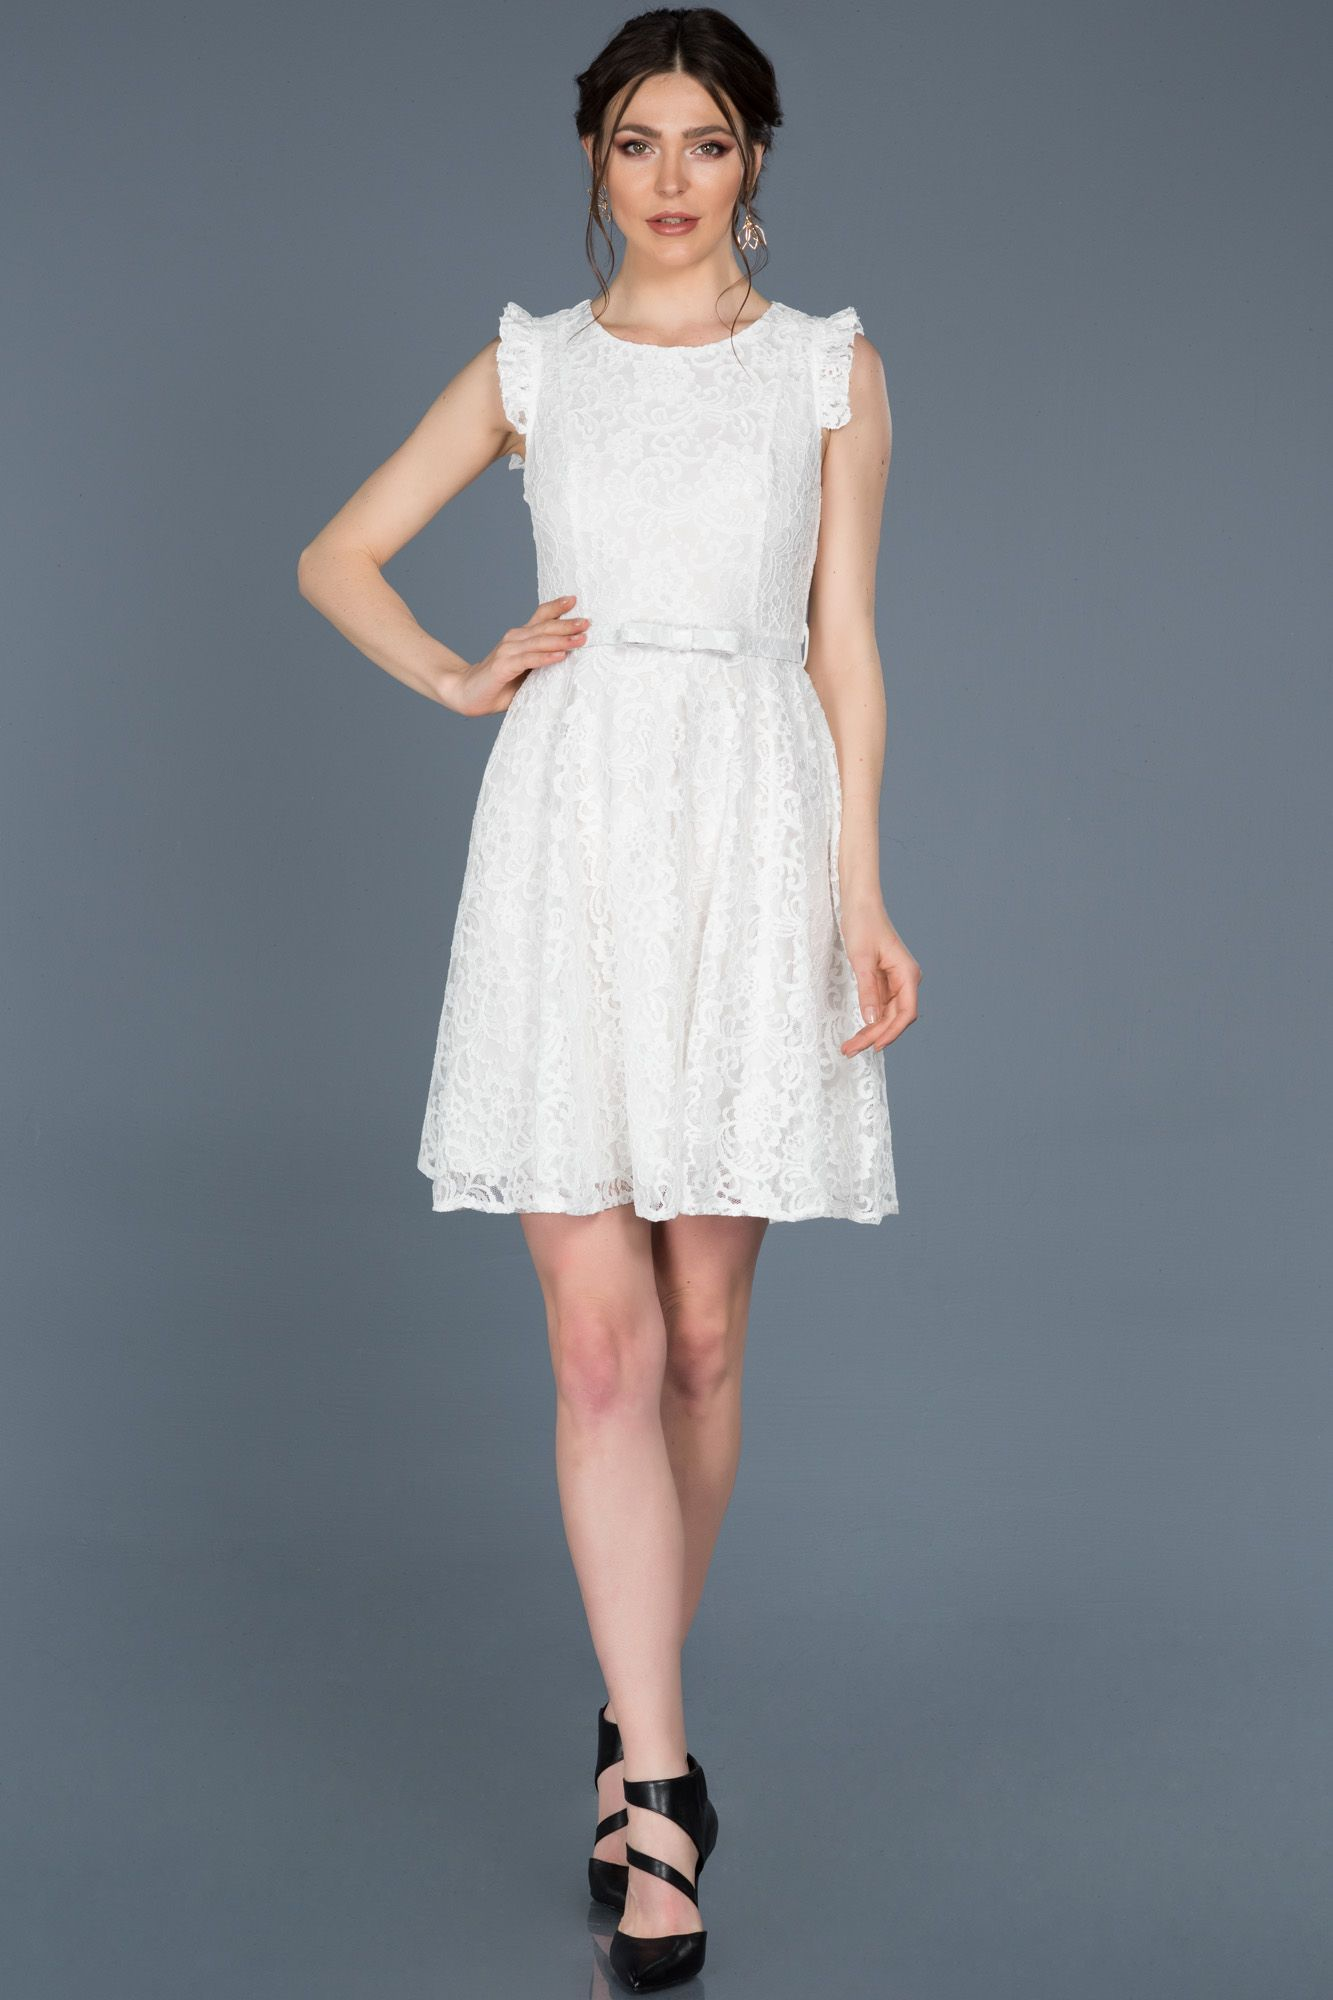 Kisa Beyaz Gupurlu Mezuniyet Elbisesi Abk454 2020 Elbise Modelleri Elbise The Dress